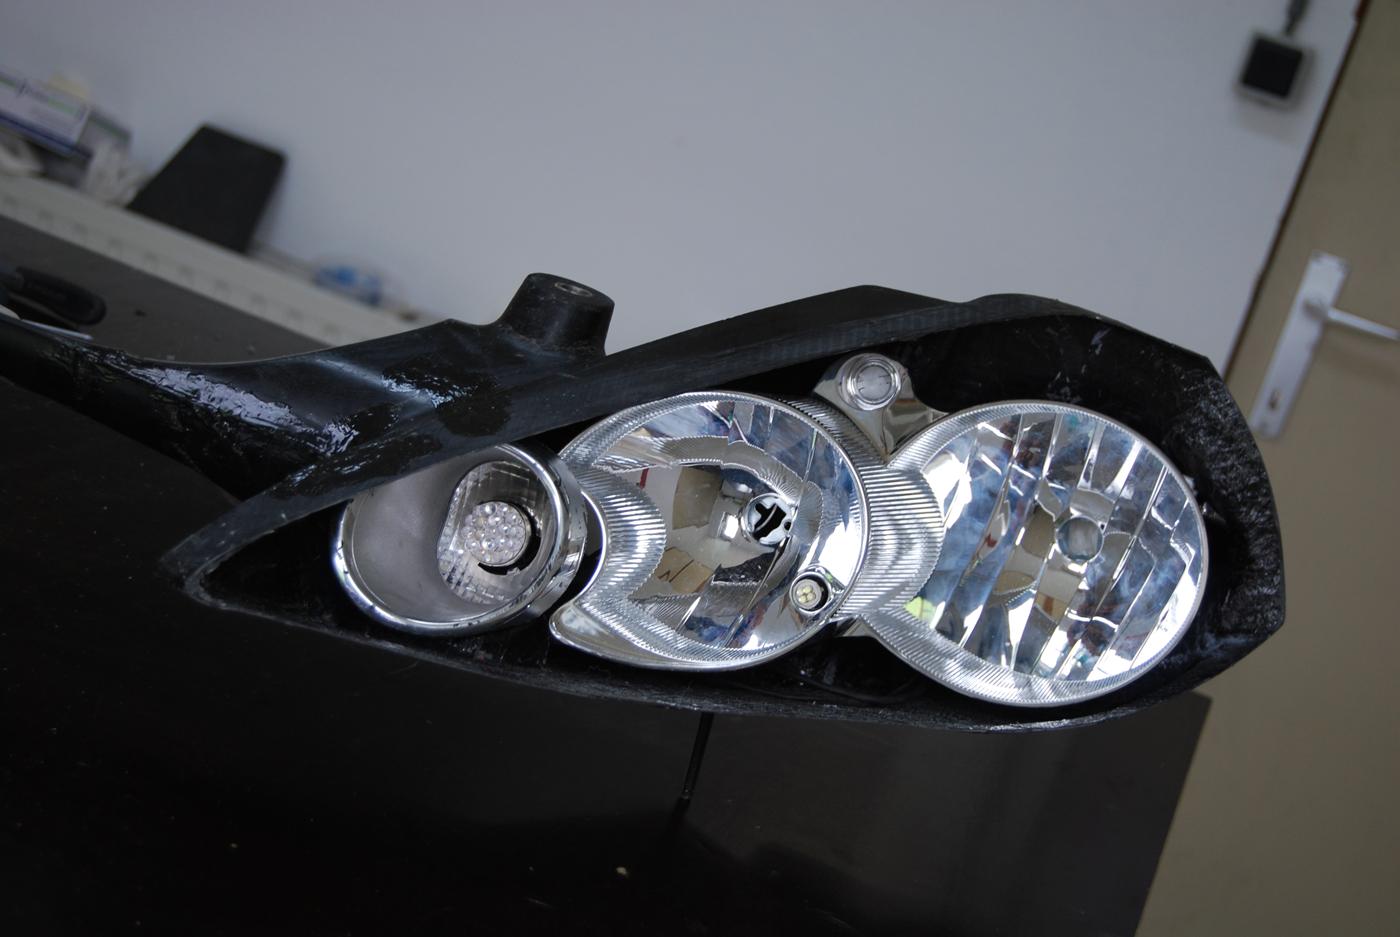 Reparation carbone Belgique automobile First wrc rampe de phares (12)